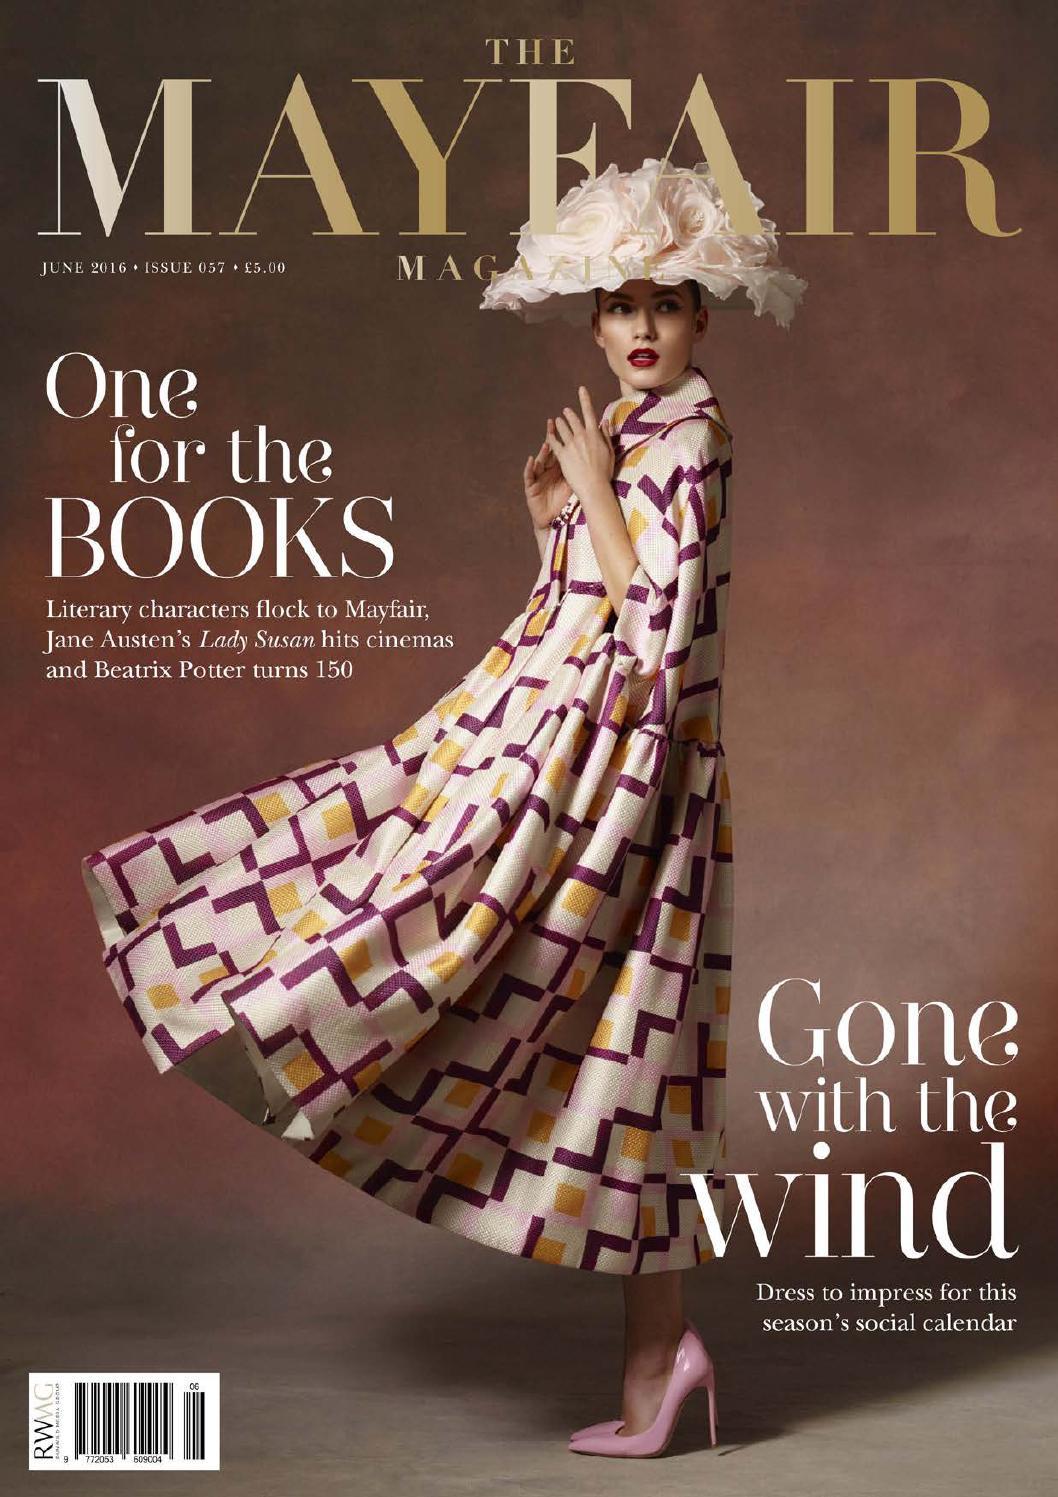 f396753786d The Mayfair Magazine June 2016 by Runwild Media Group - issuu